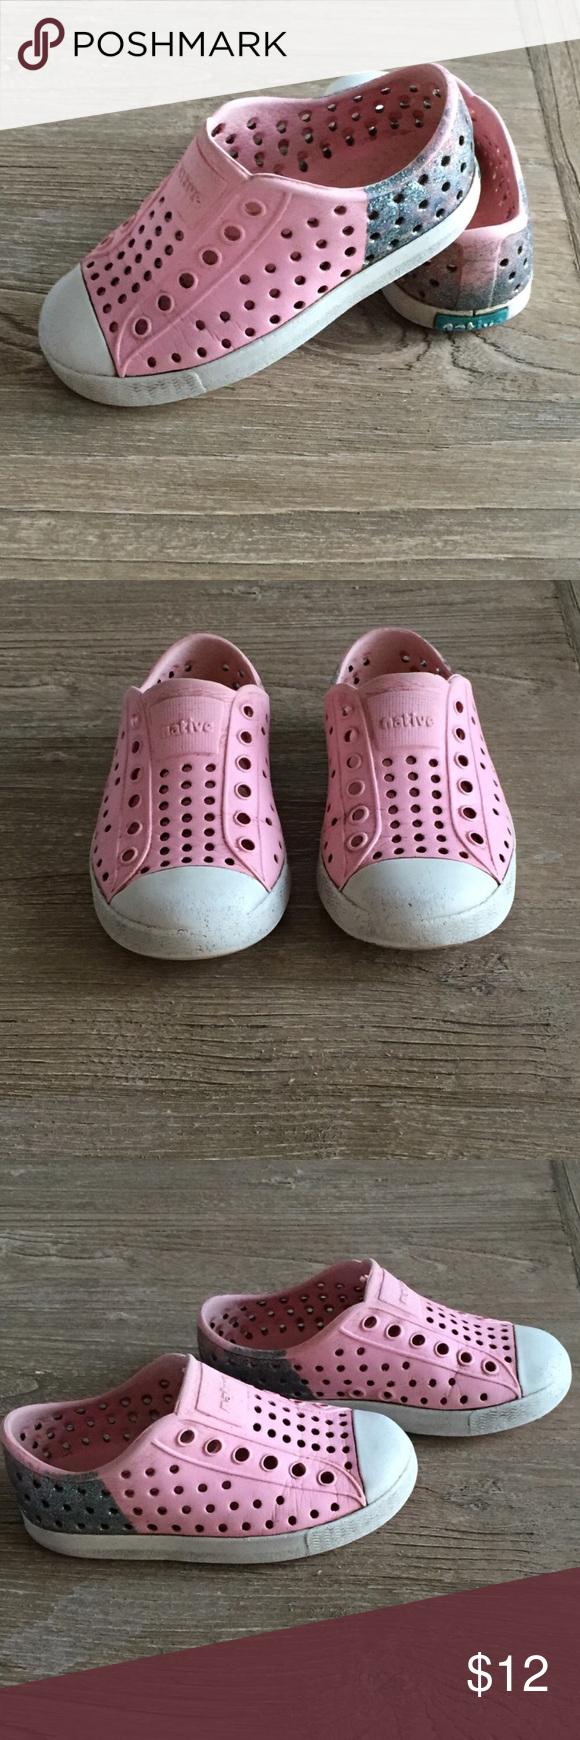 Natives Pink/Glitter Jefferson Shoes C7